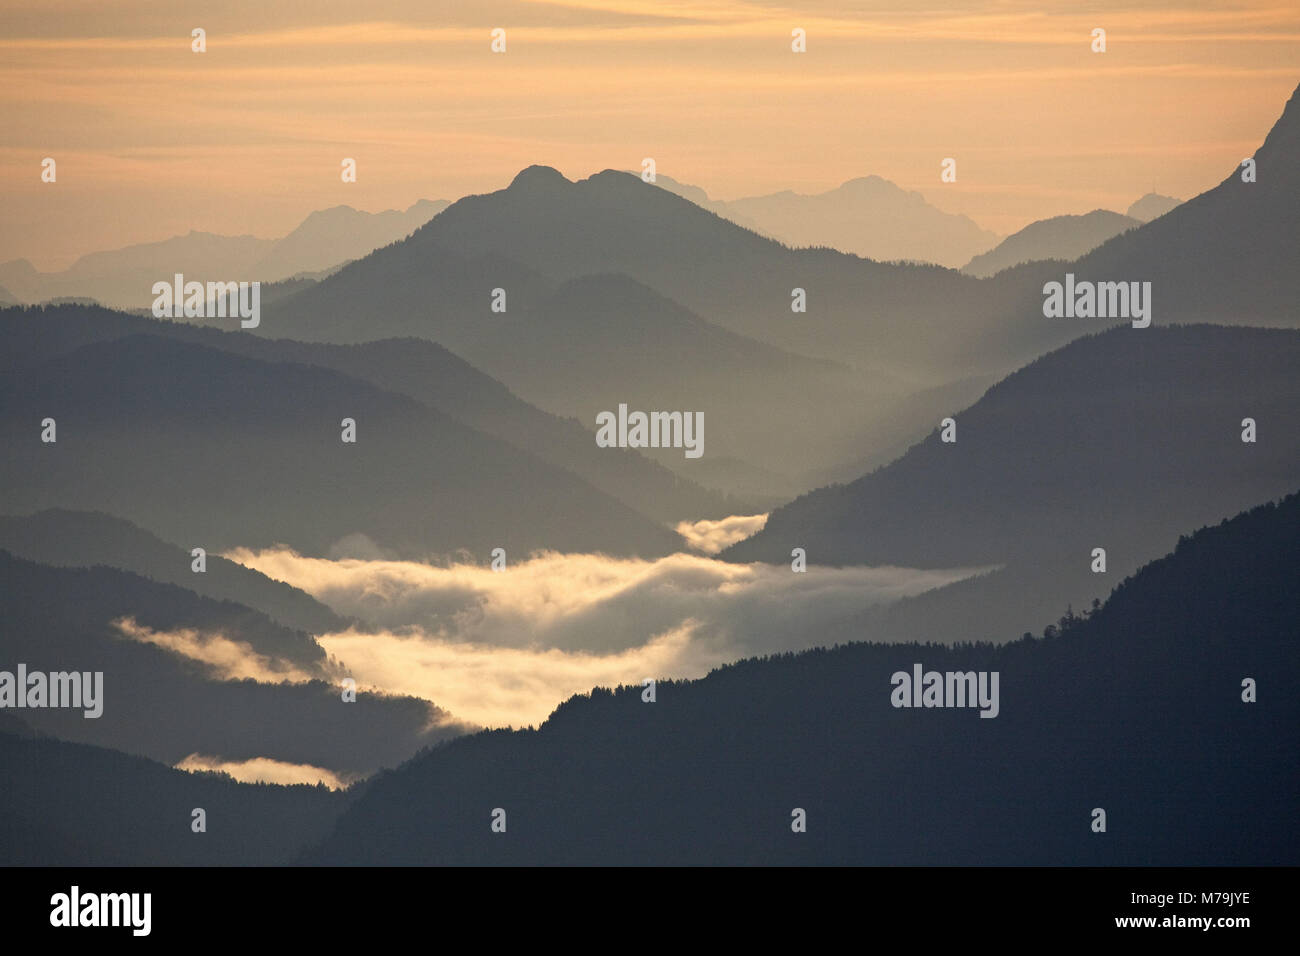 View of the 'Herzogstand' to Tyrol, Schneidjoch, Bavarian pre-alpine, Alpine foreland, alps, Bavarian uplands, - Stock Image